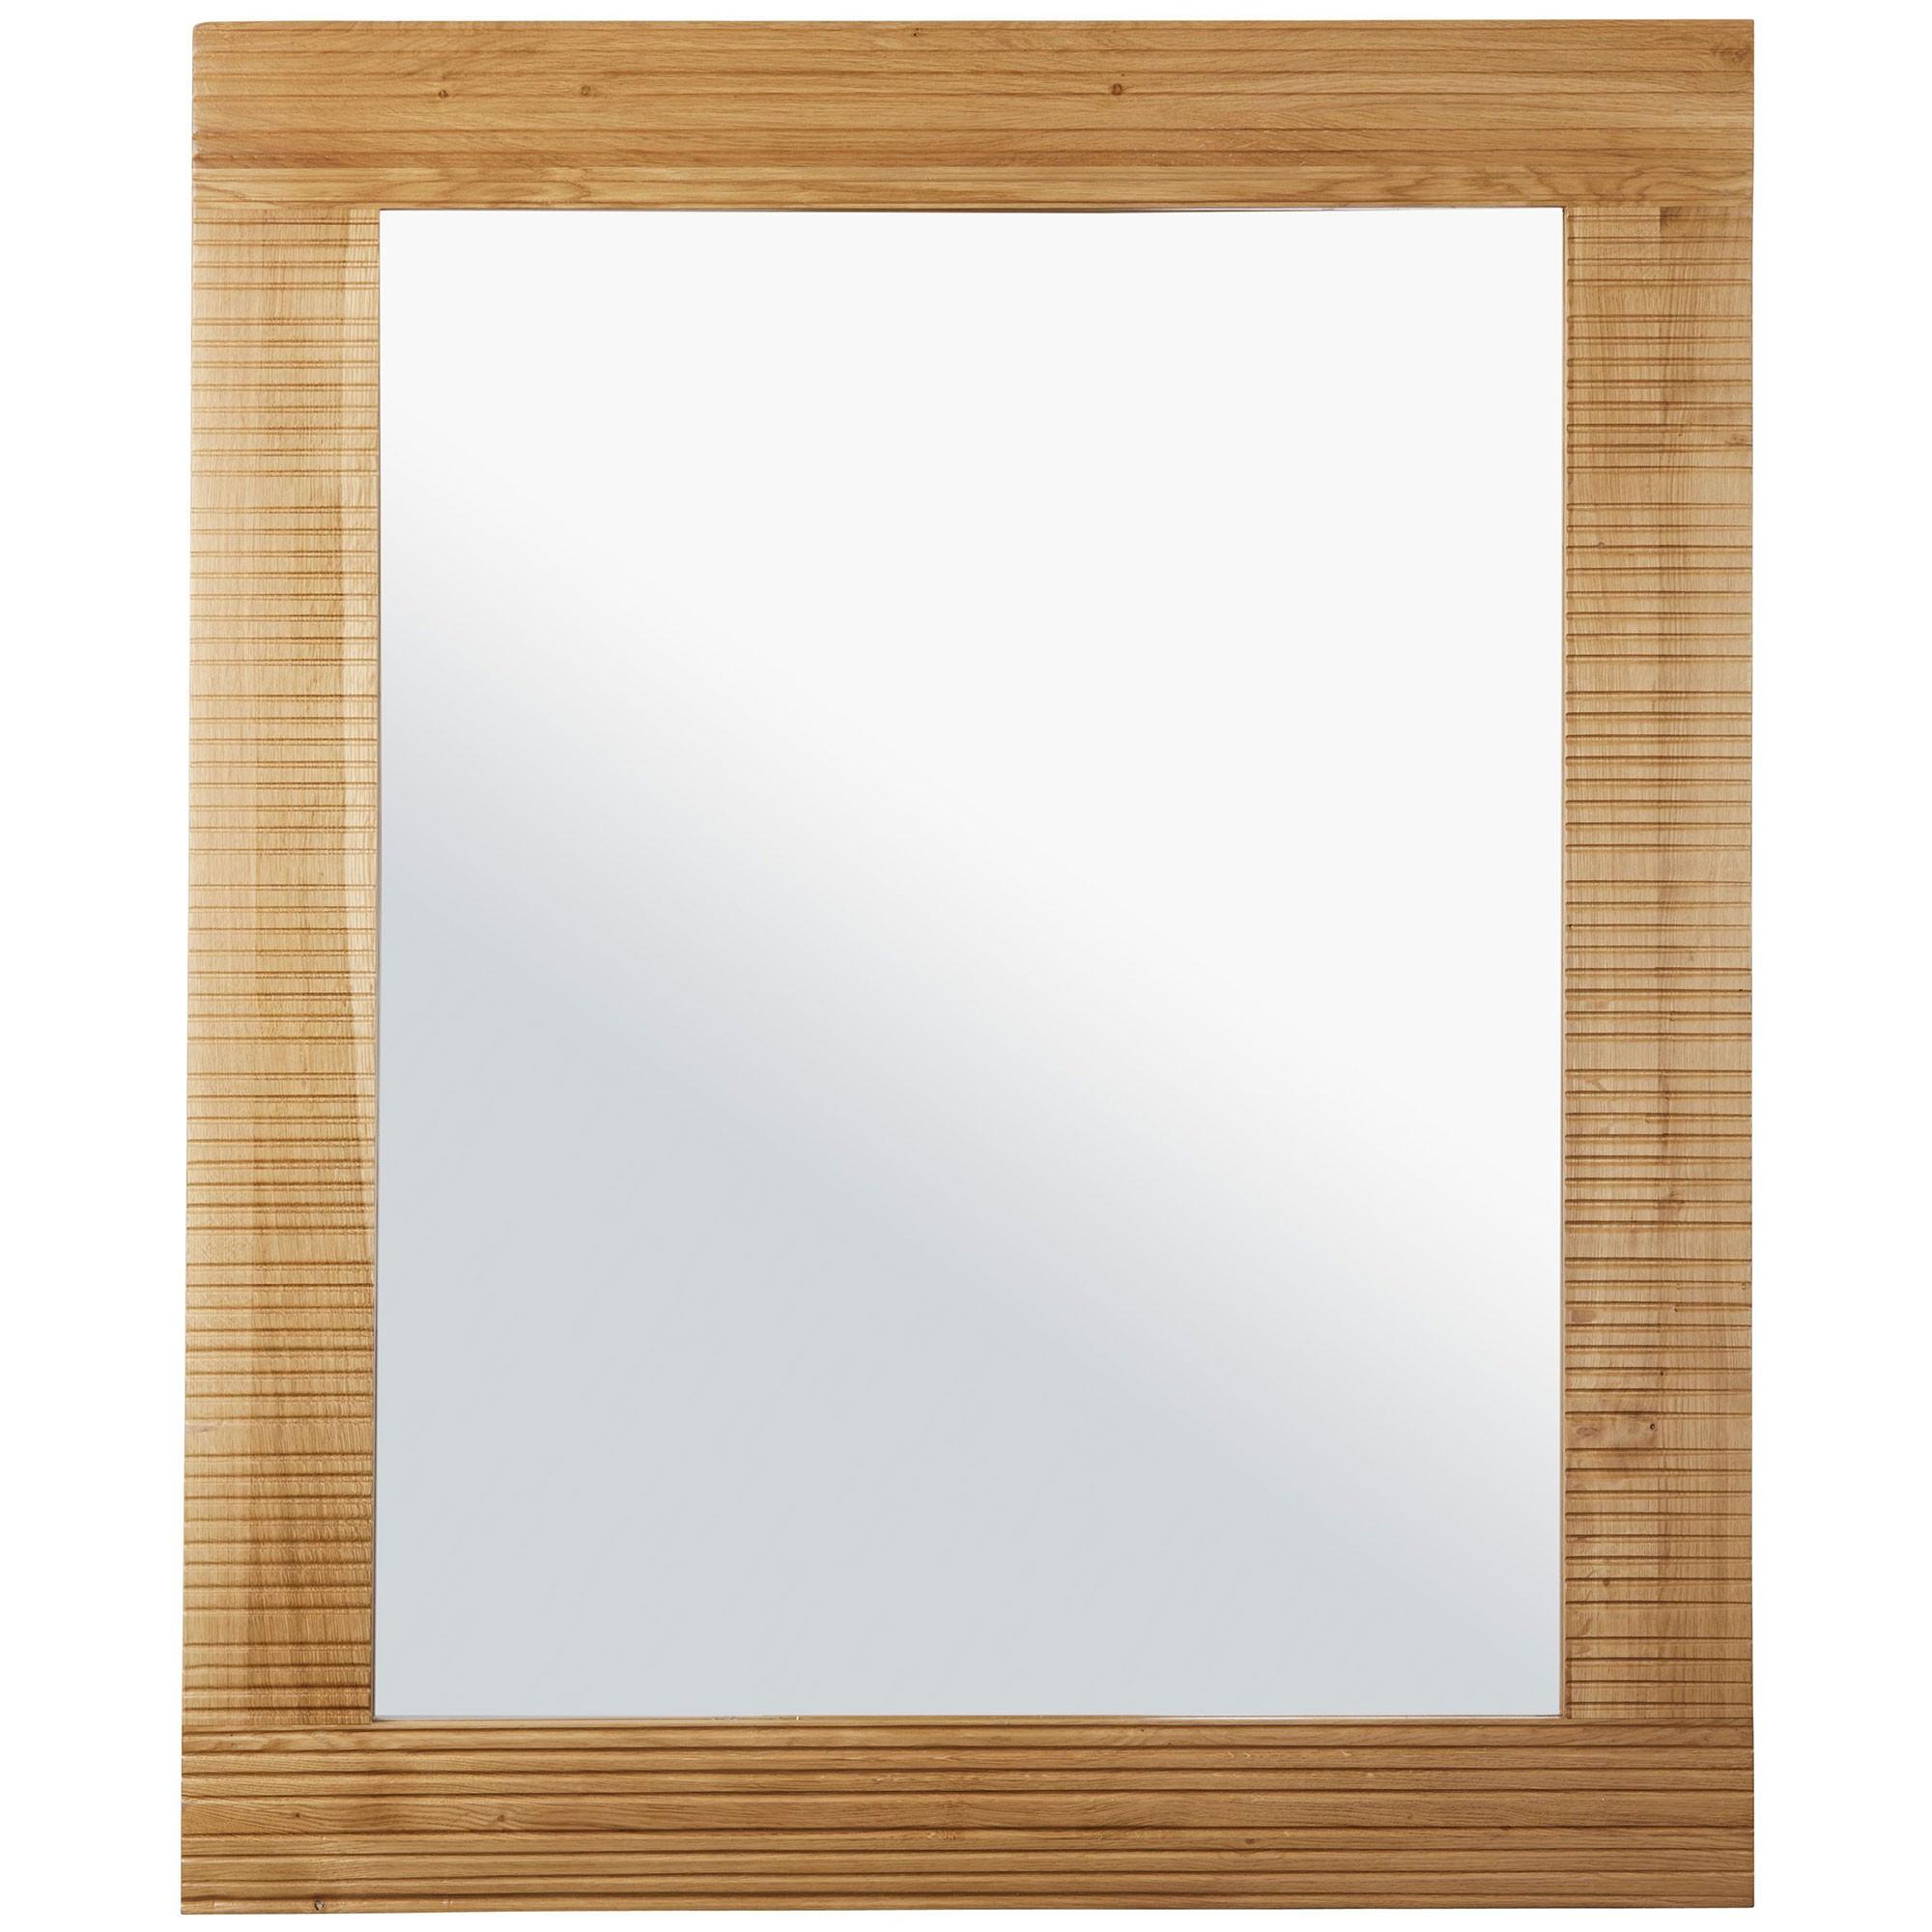 Griffin Oak Timber Framed Wall Mirror, 120cm